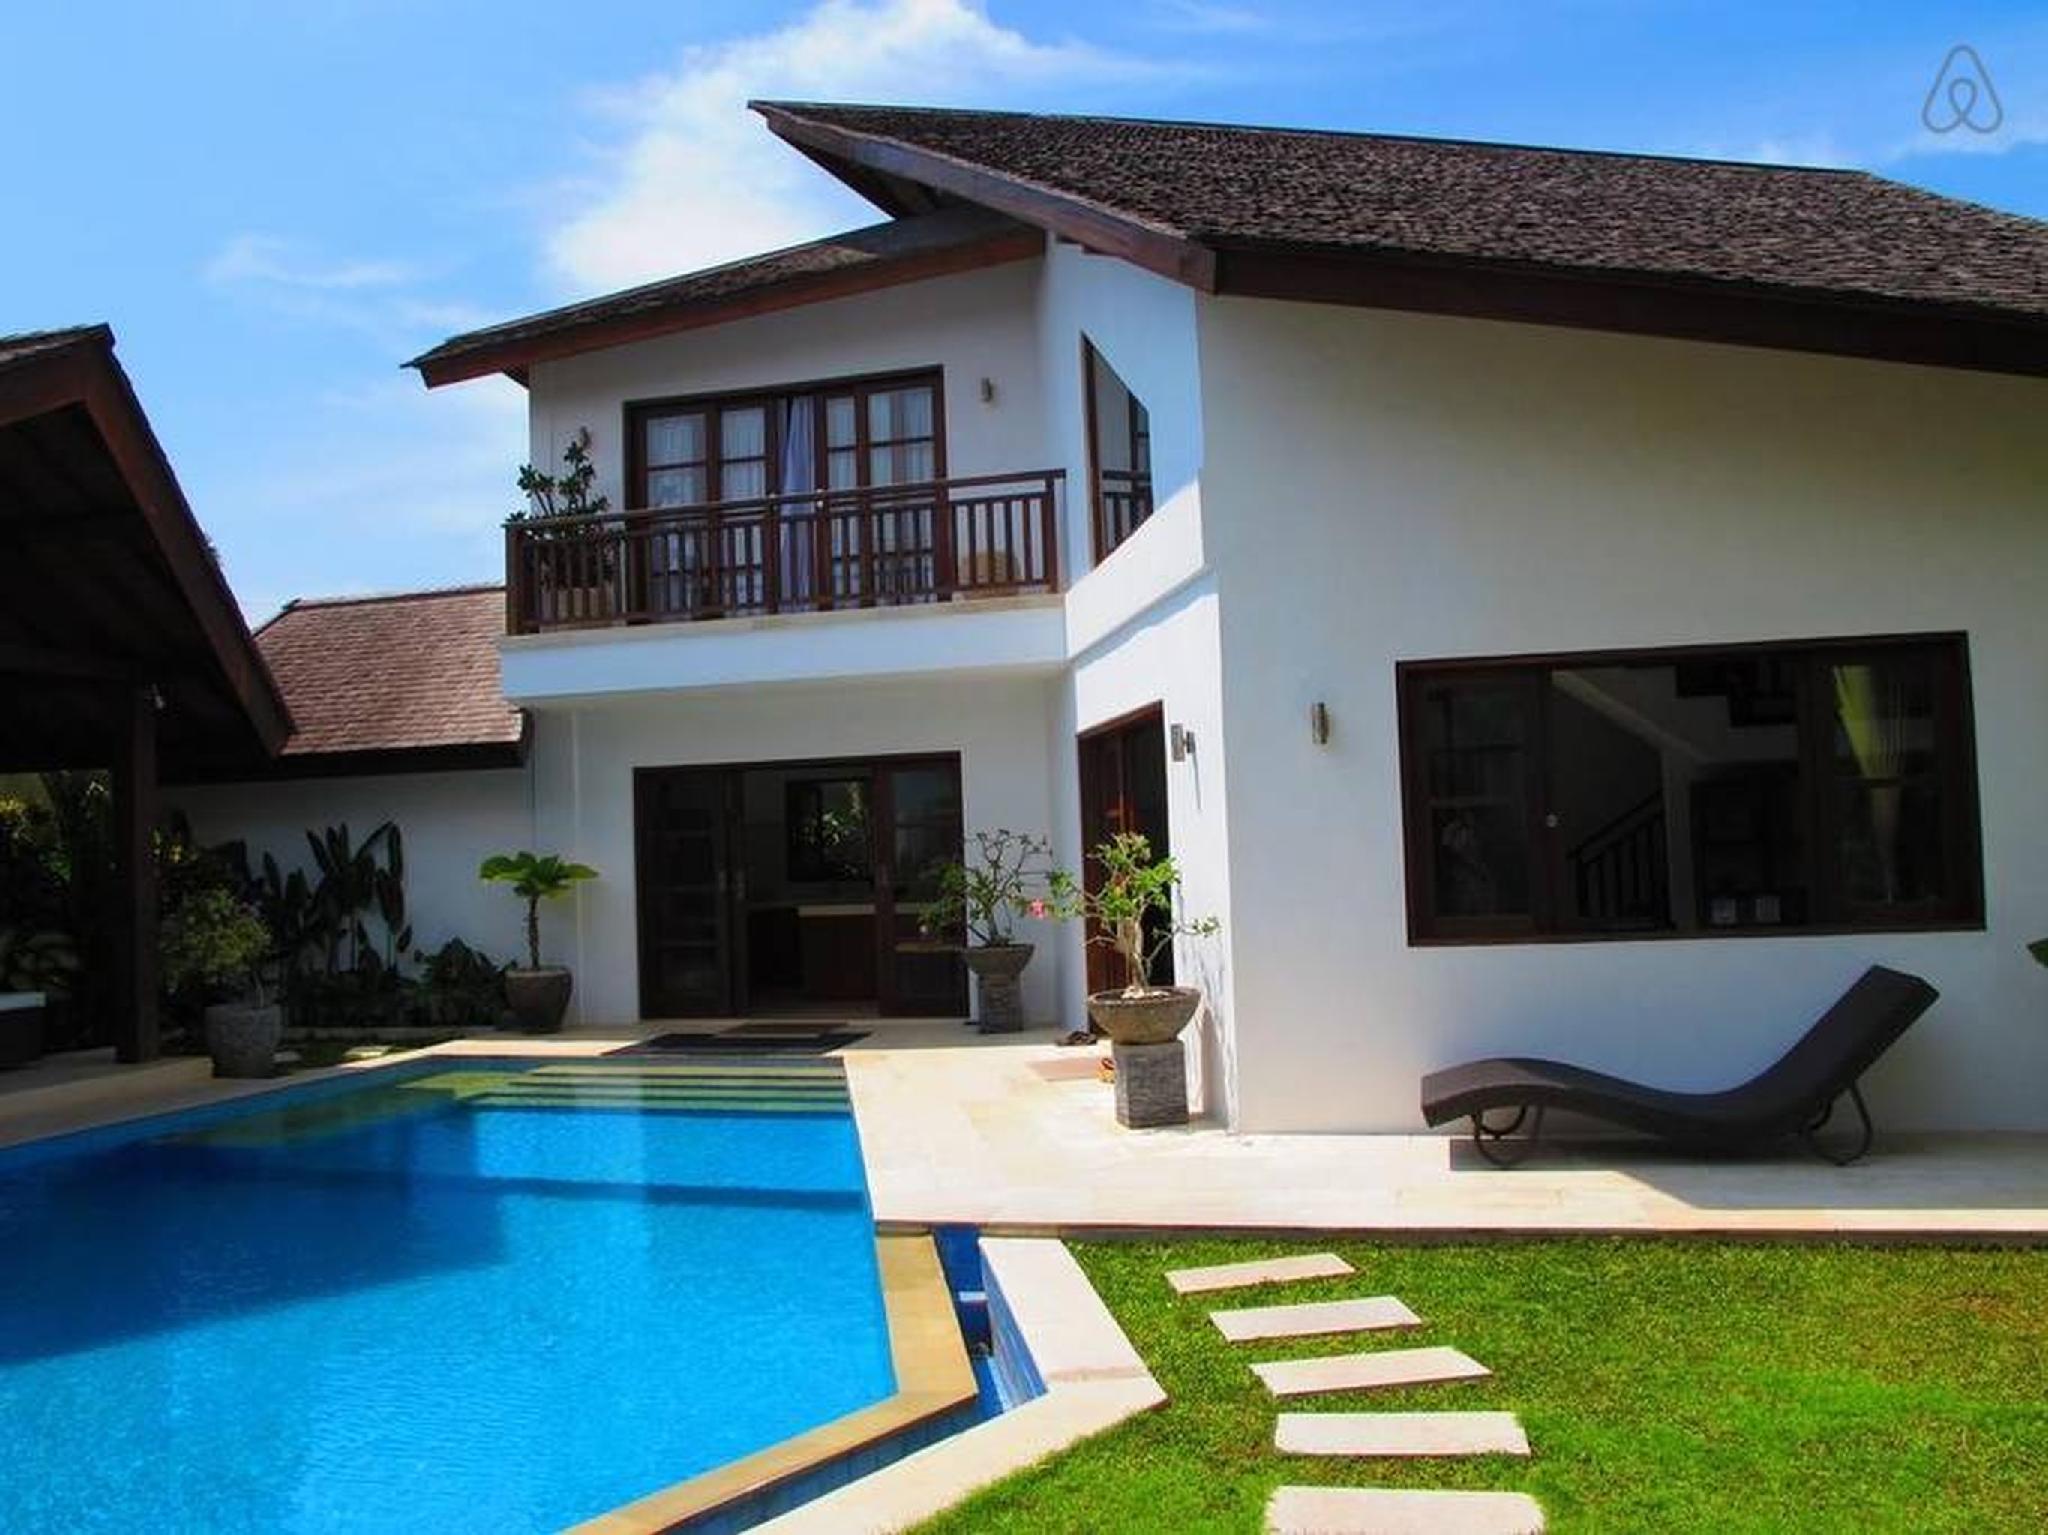 3 BDR Origami Luxury Villa Seminyak